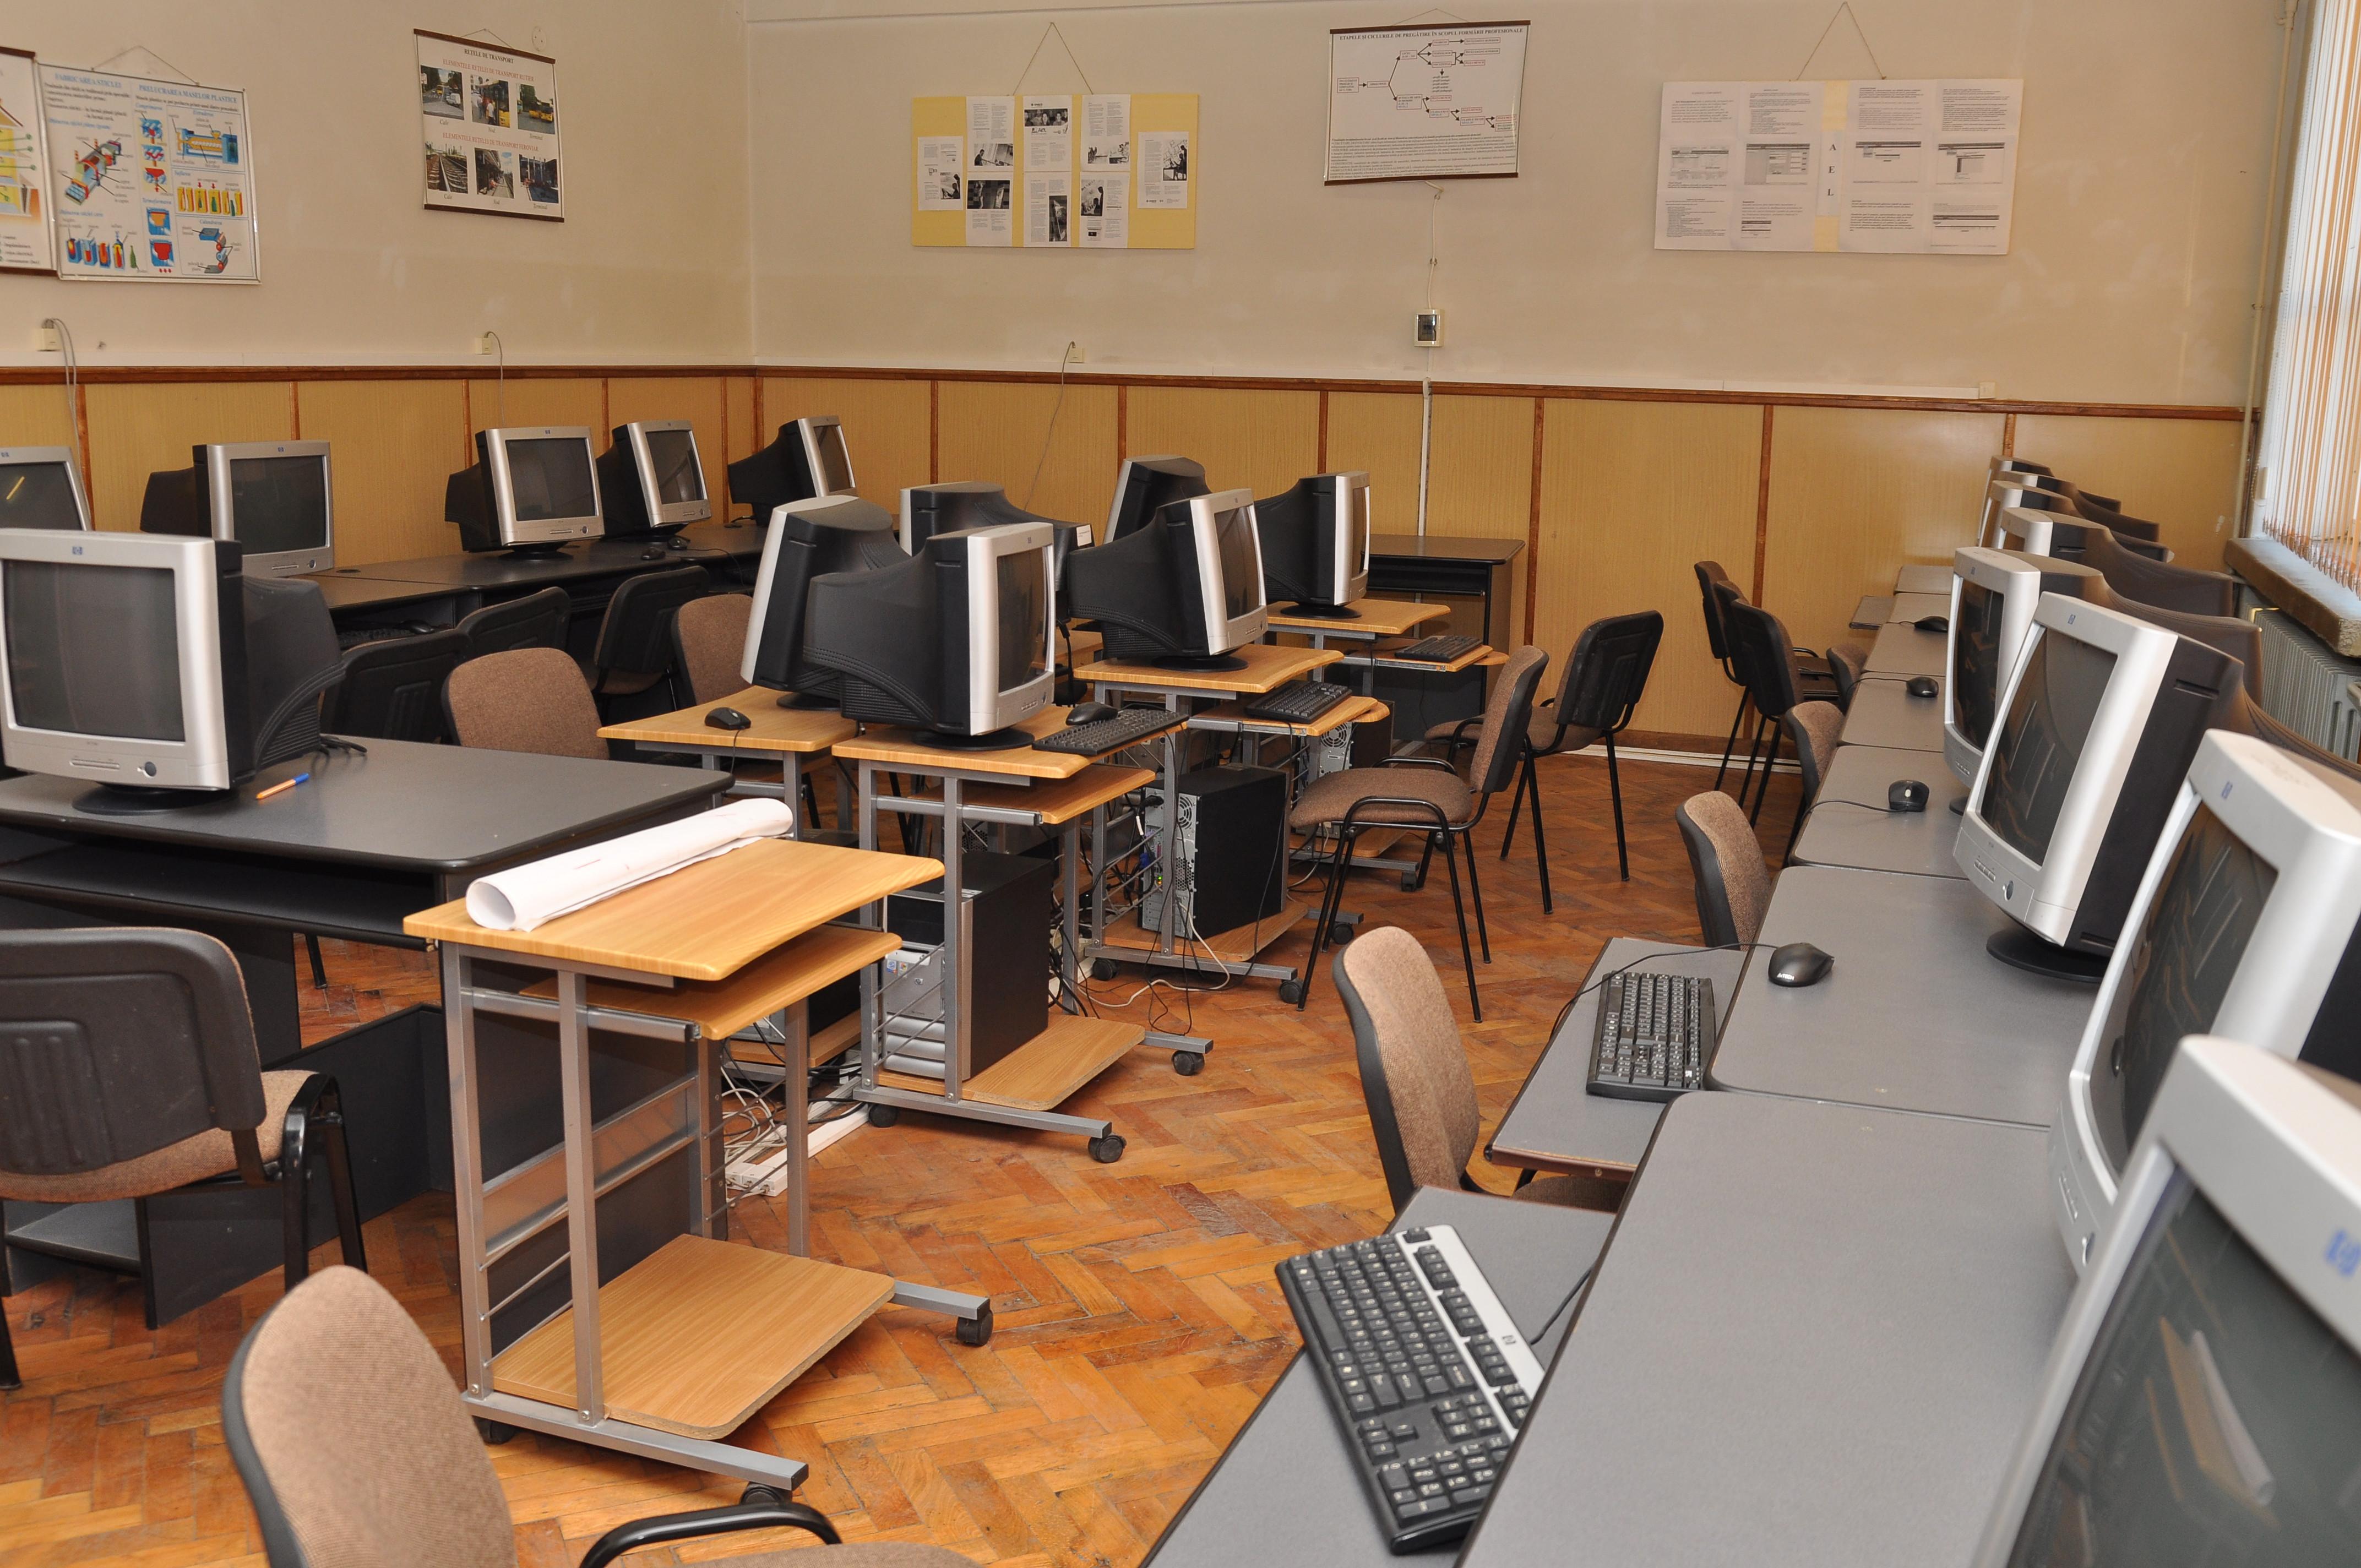 Laborator de Informatica (1)